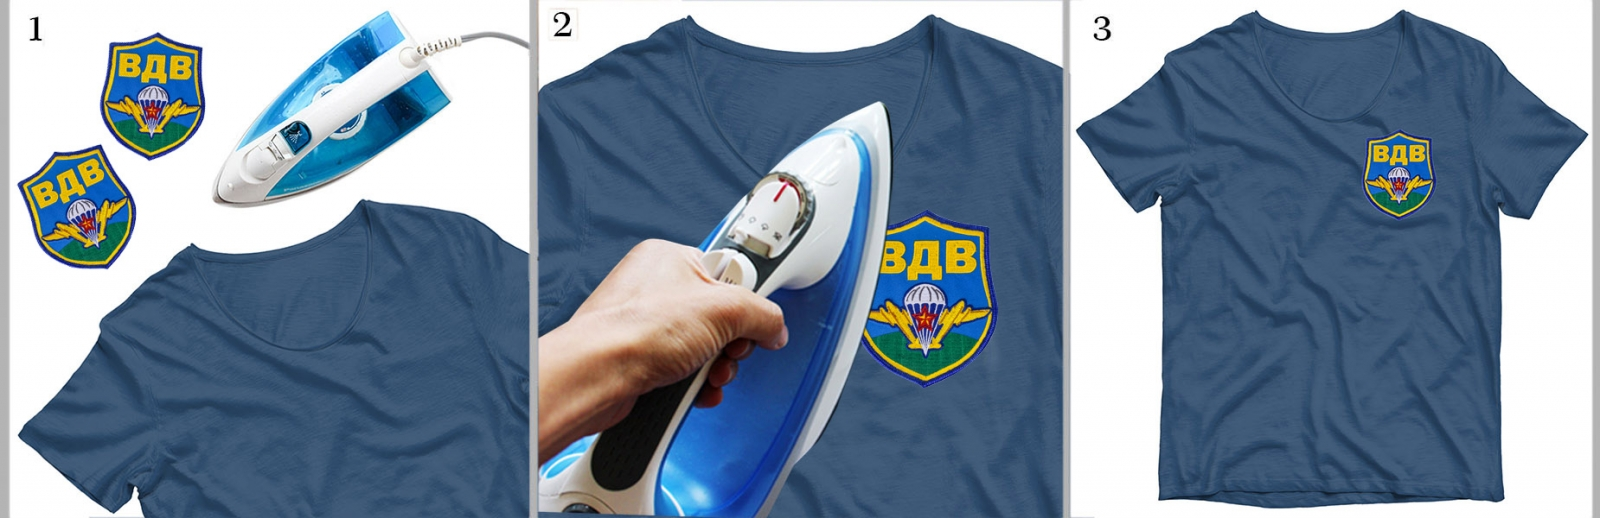 Термоклеевый шеврон ВДВ на футболке